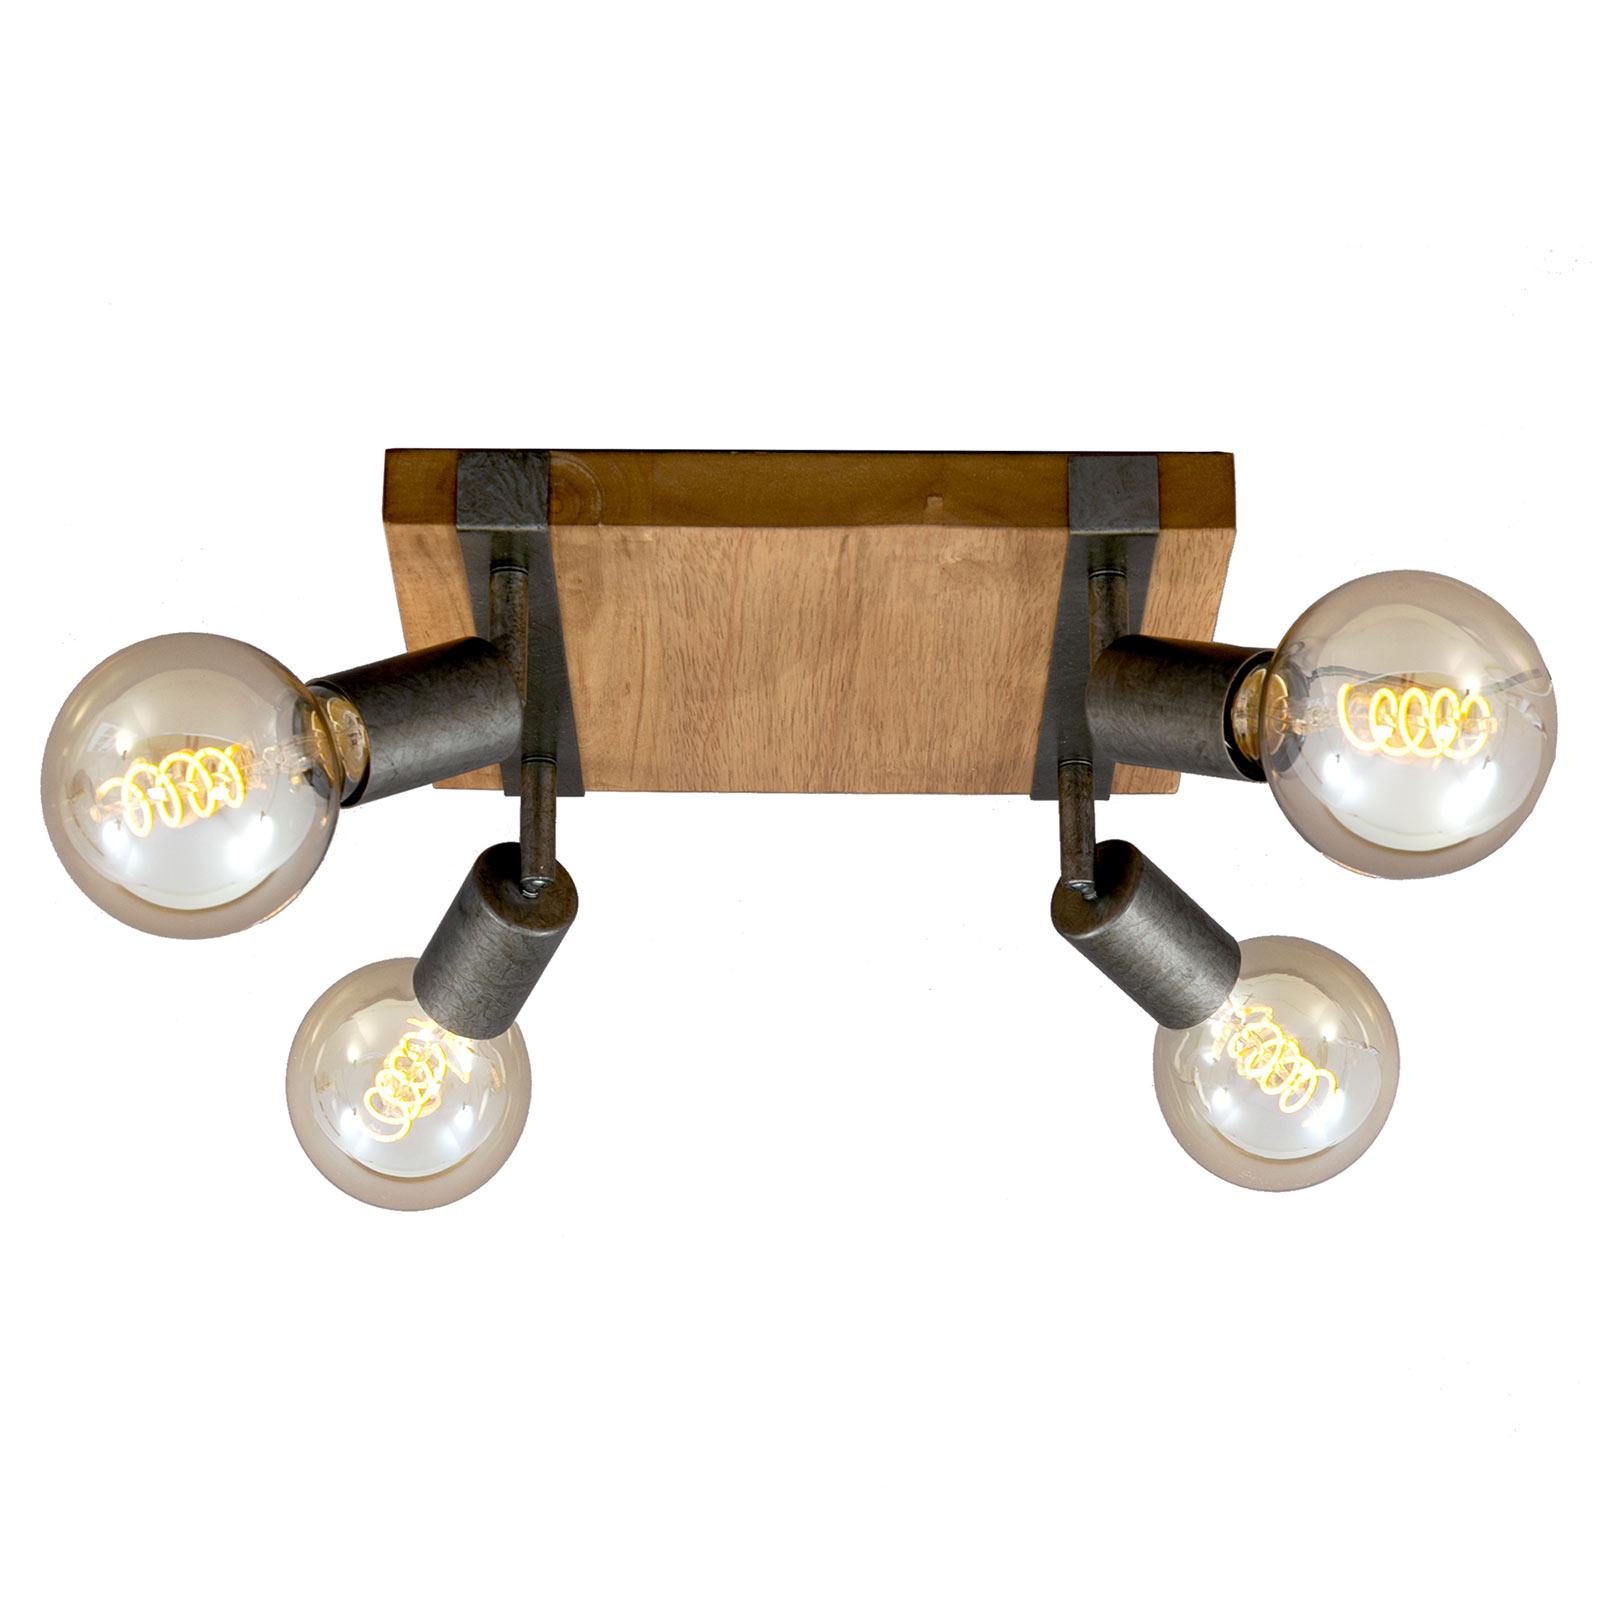 Deckenlampe Wood Basic, vierflammig